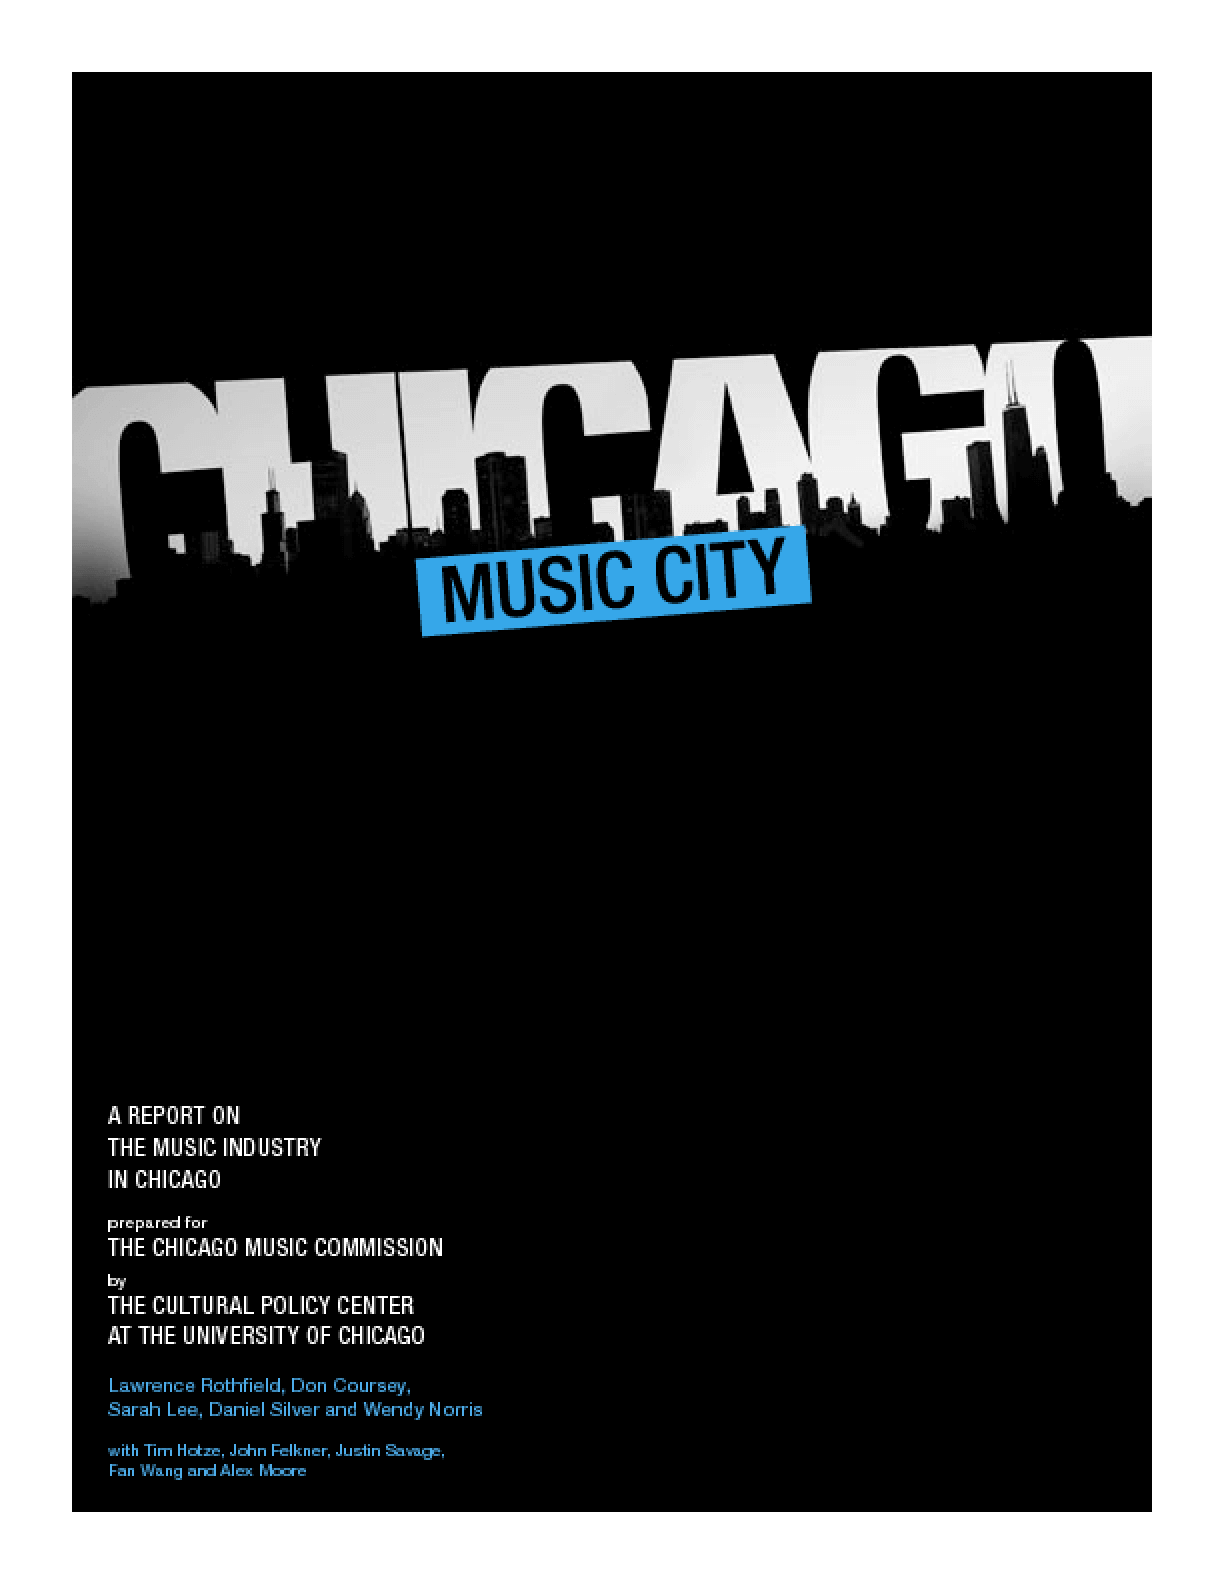 Chicago Music City